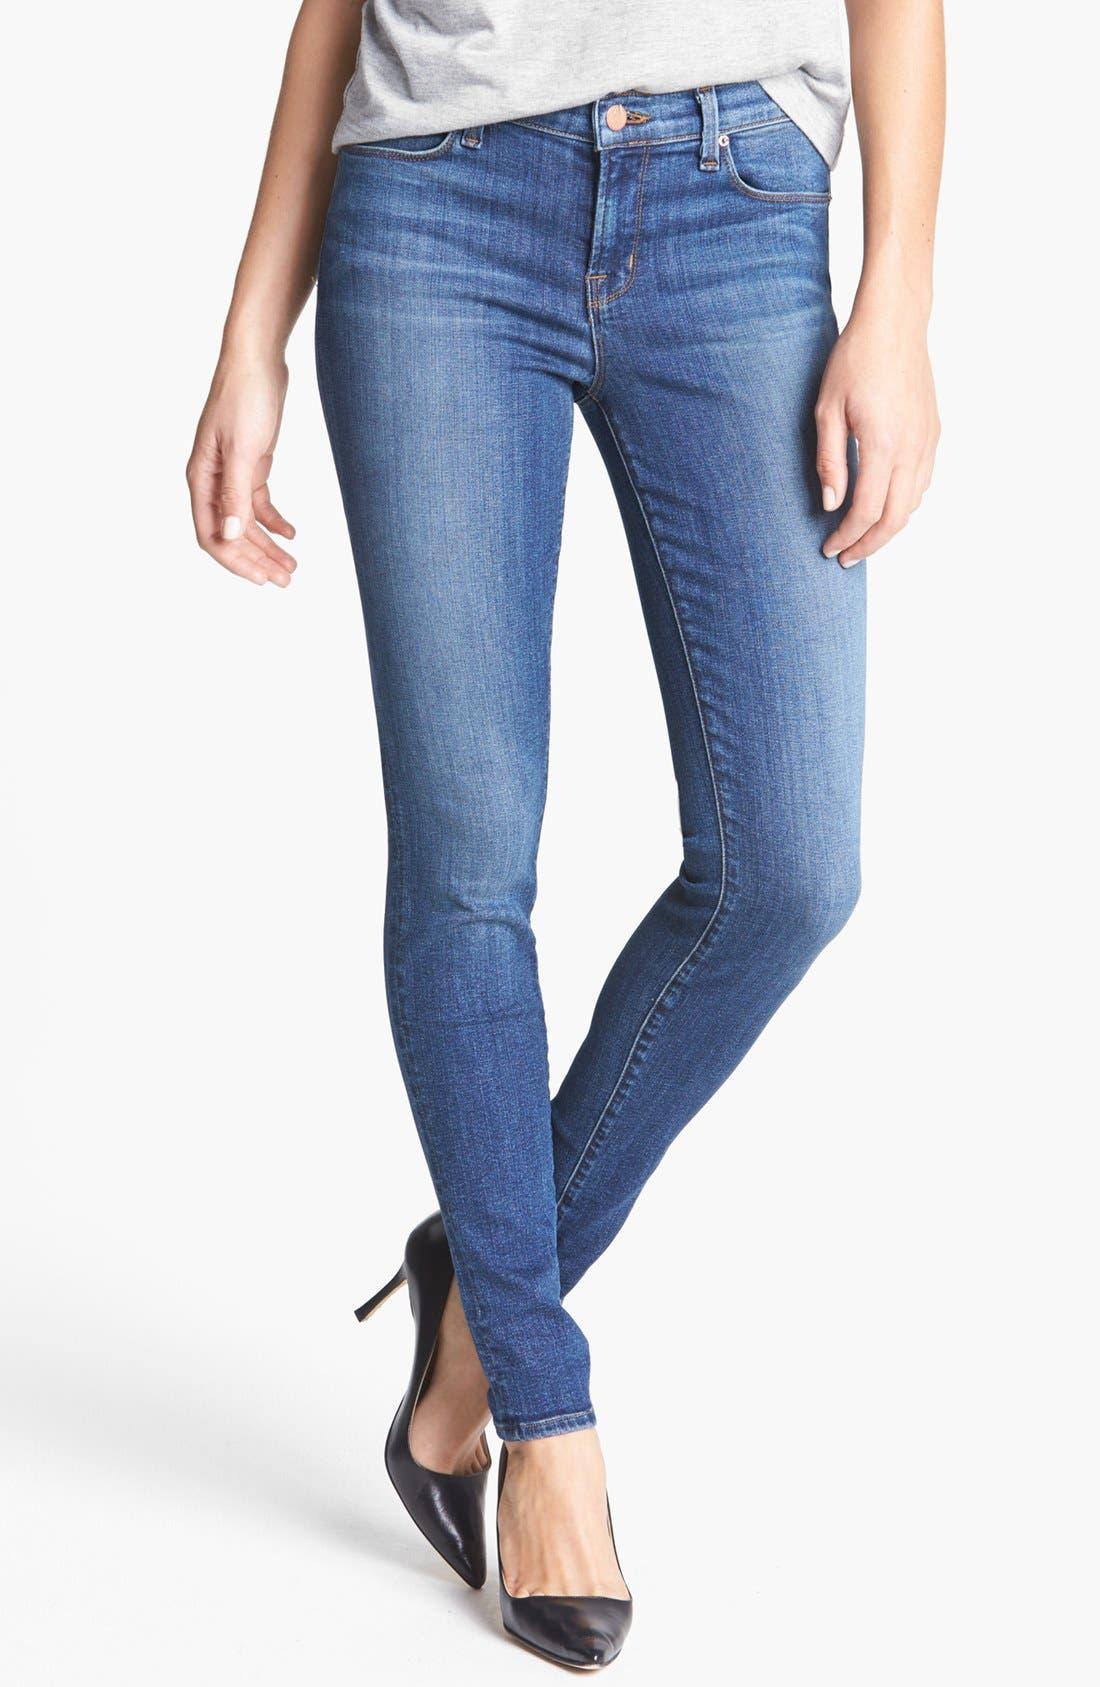 Main Image - J Brand '620' Mid-Rise Skinny Jeans (Refuge)